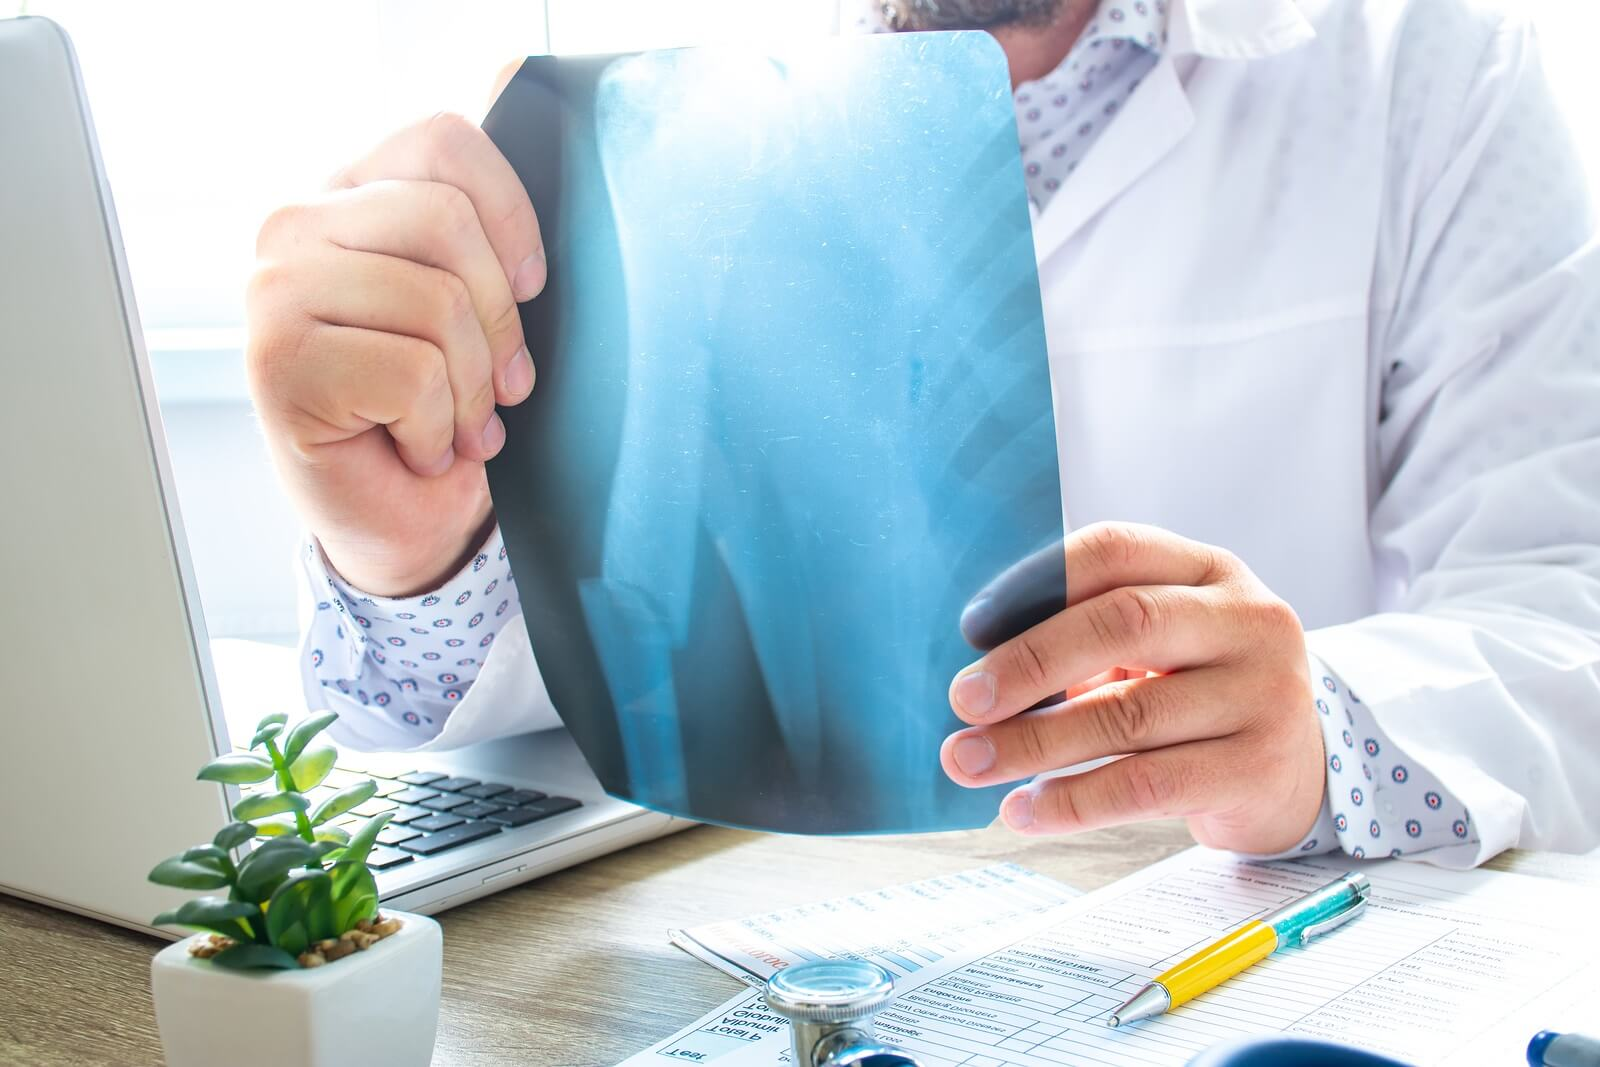 compensation and settlement for broken bones